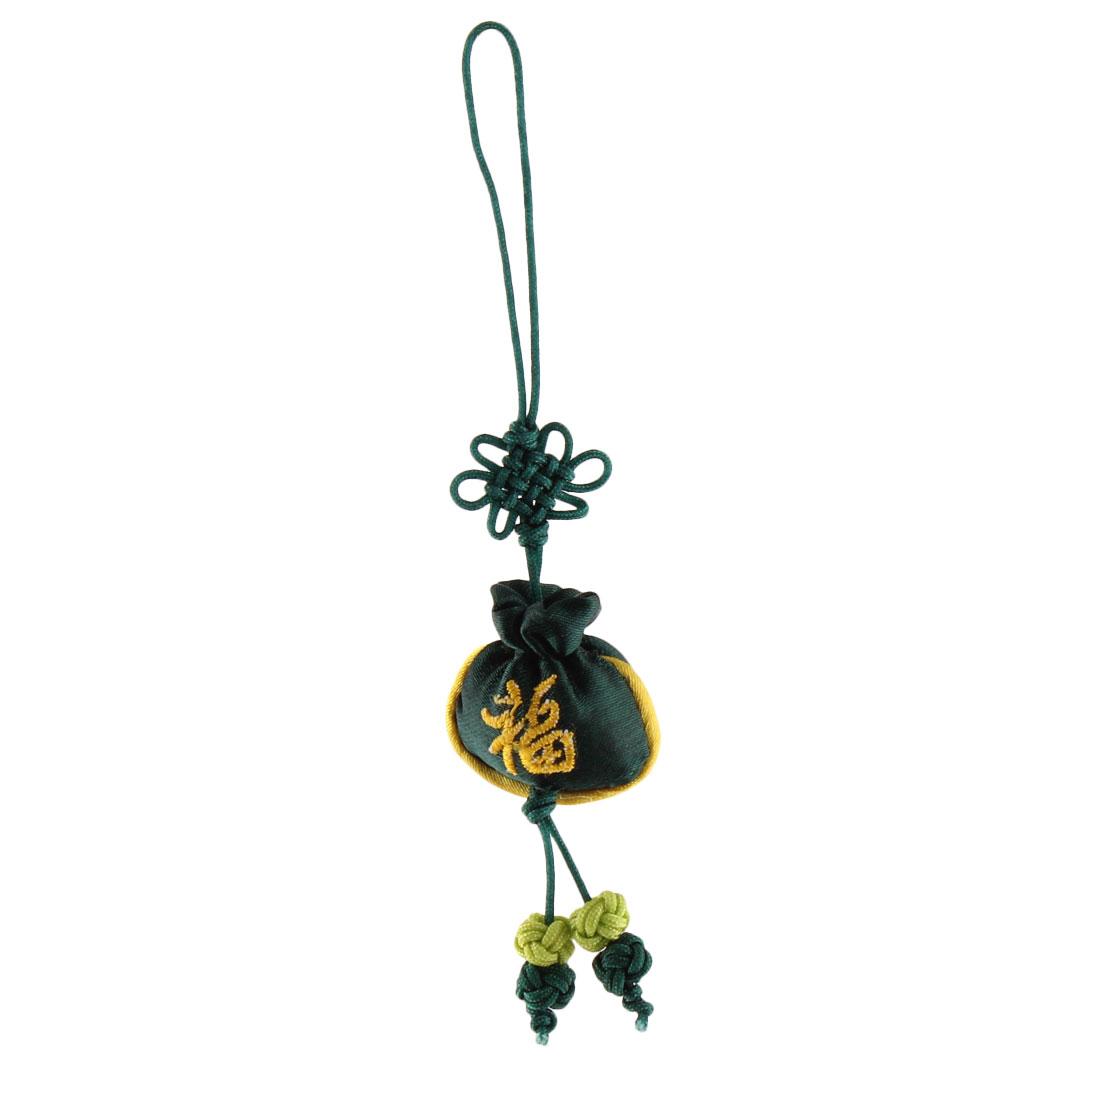 Household Mini Chinese Embroidery Luck Hanging Sachet Pendant Knot Dark Green